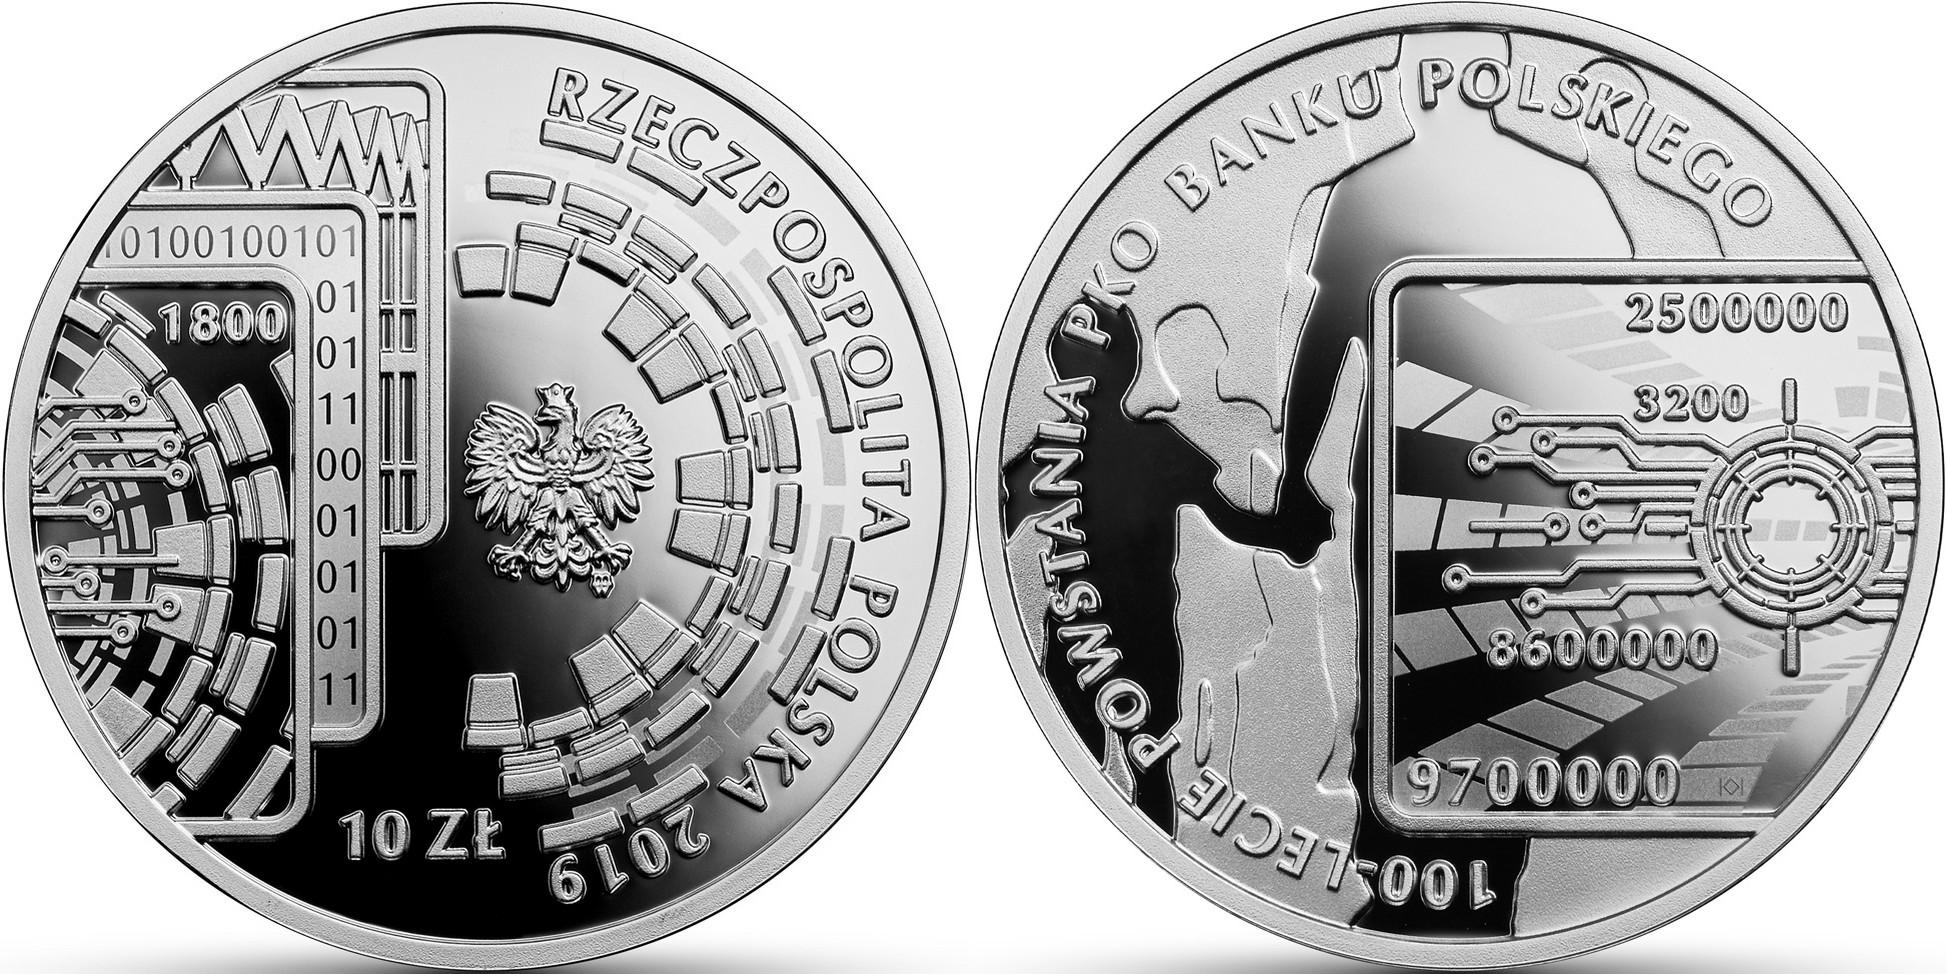 pologne-2019-100-ans-banque-PKO